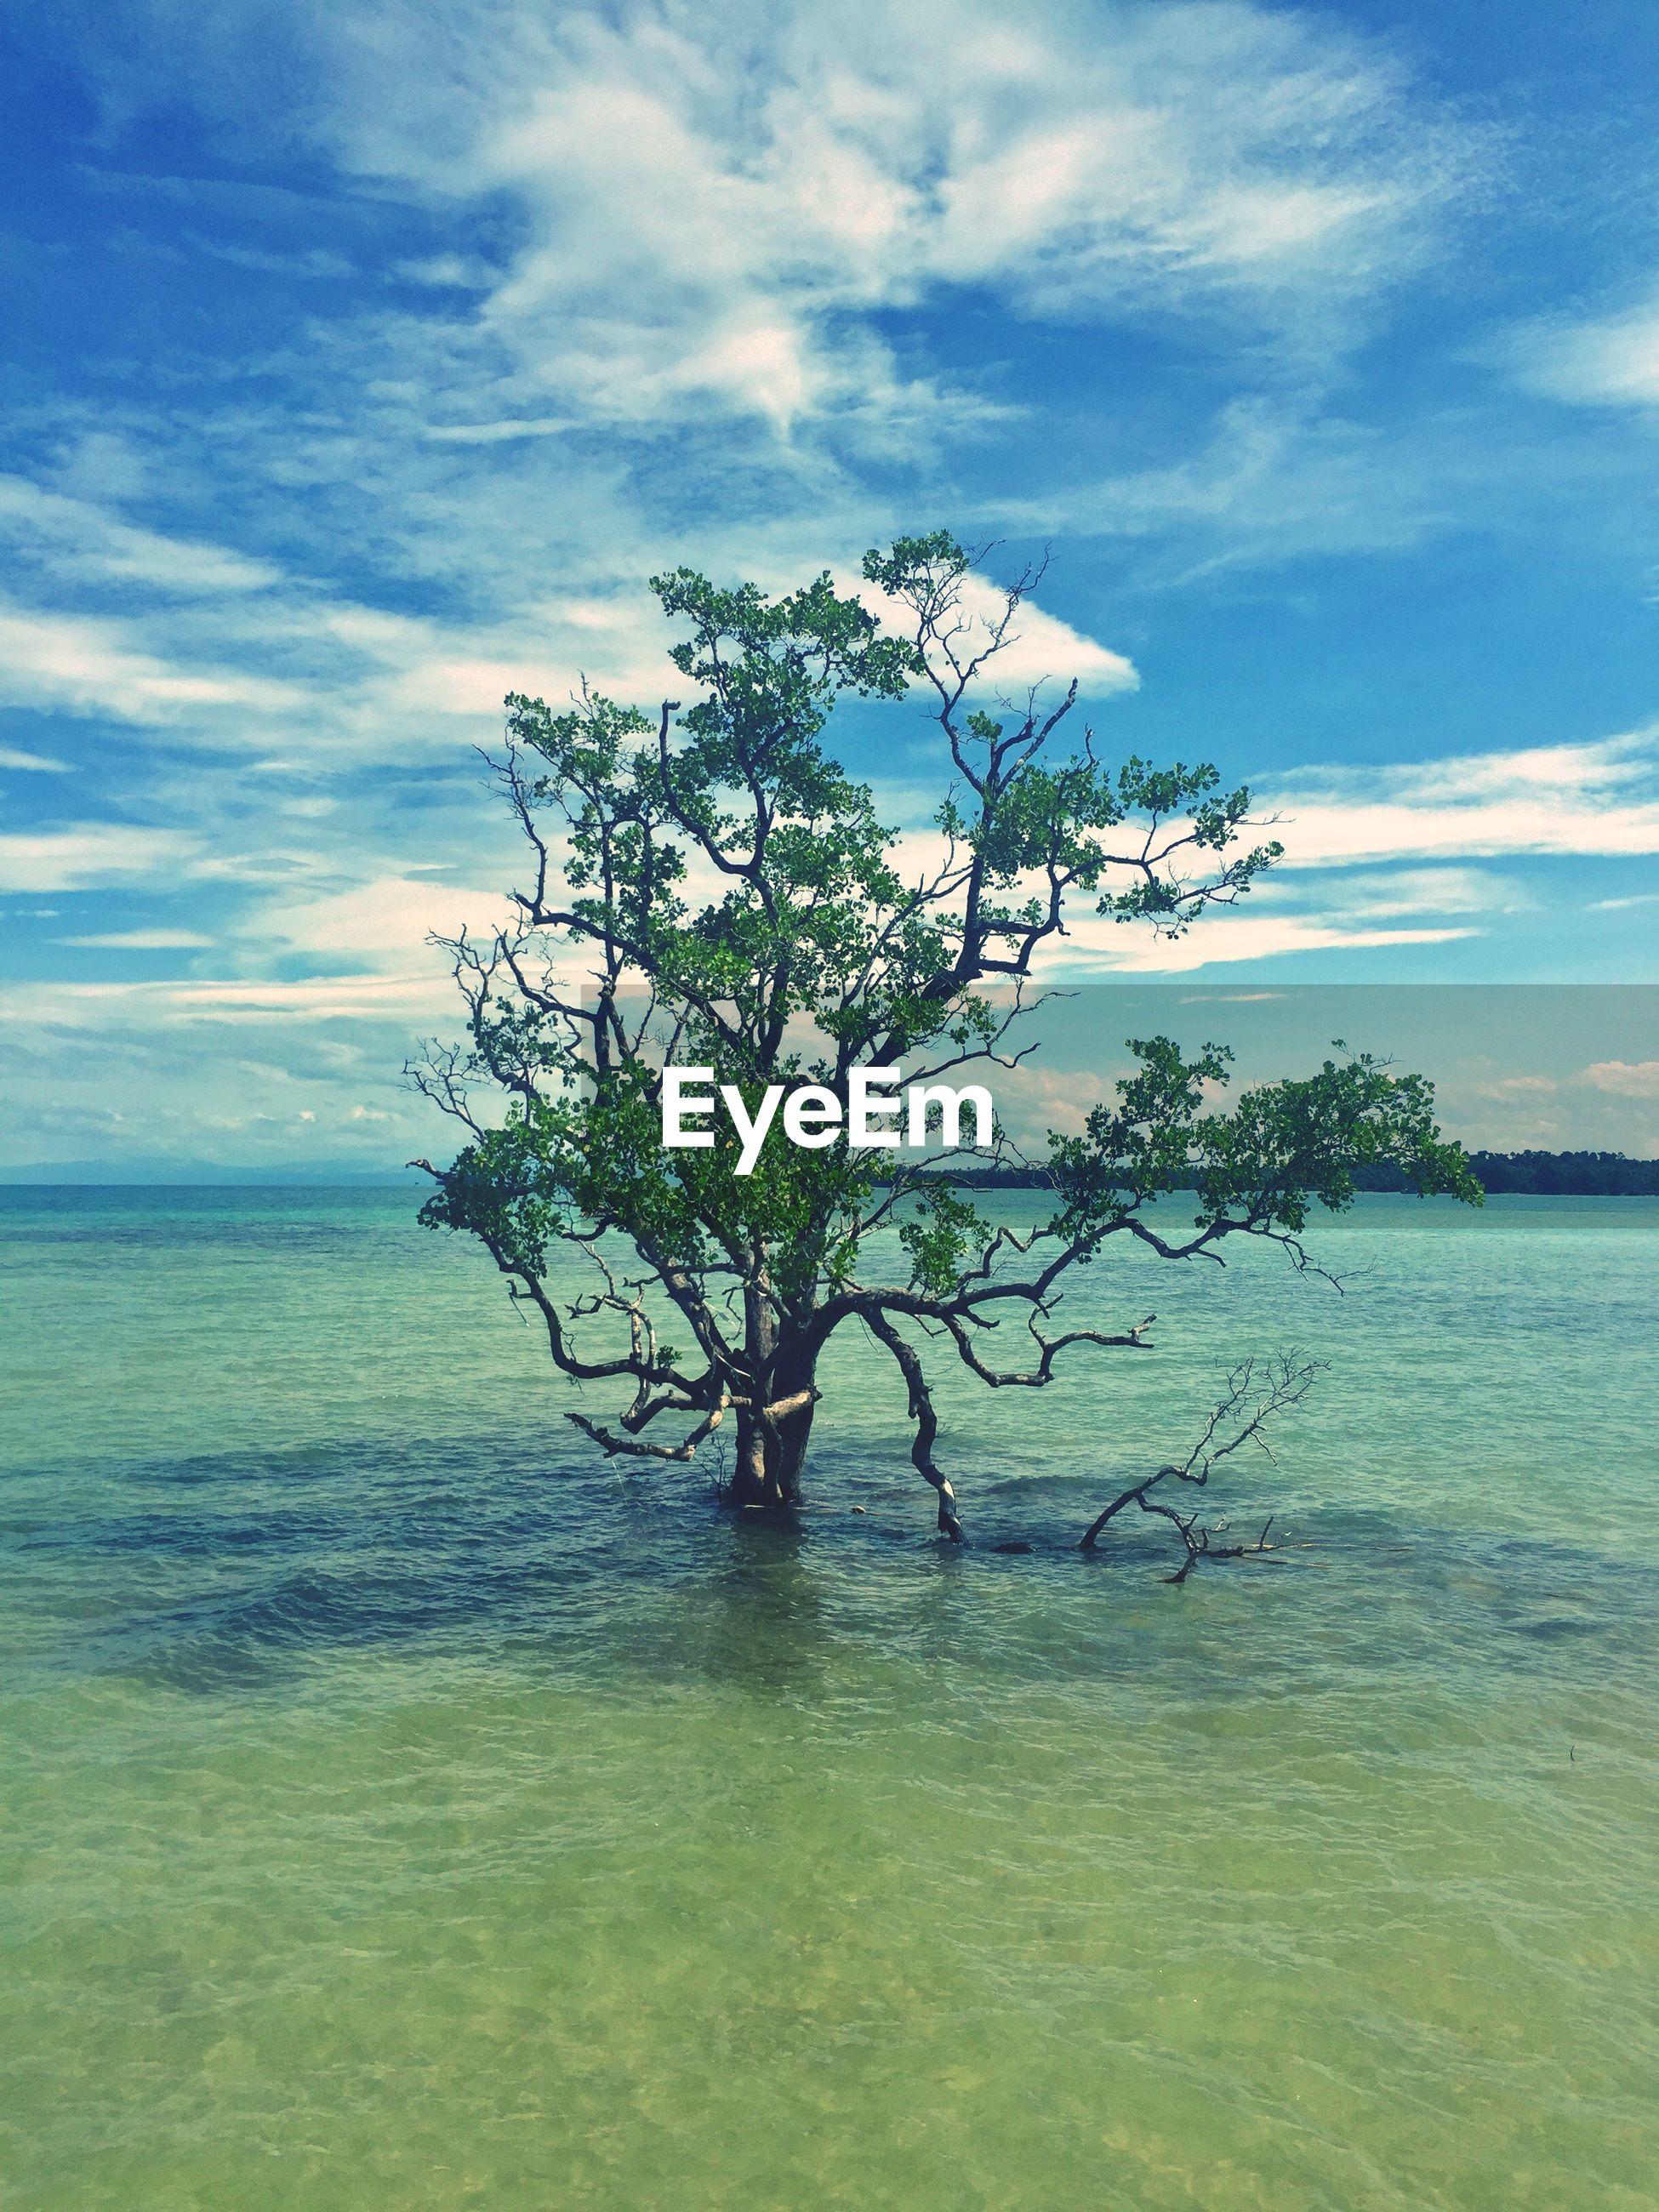 TREE ON SHORE AGAINST SKY